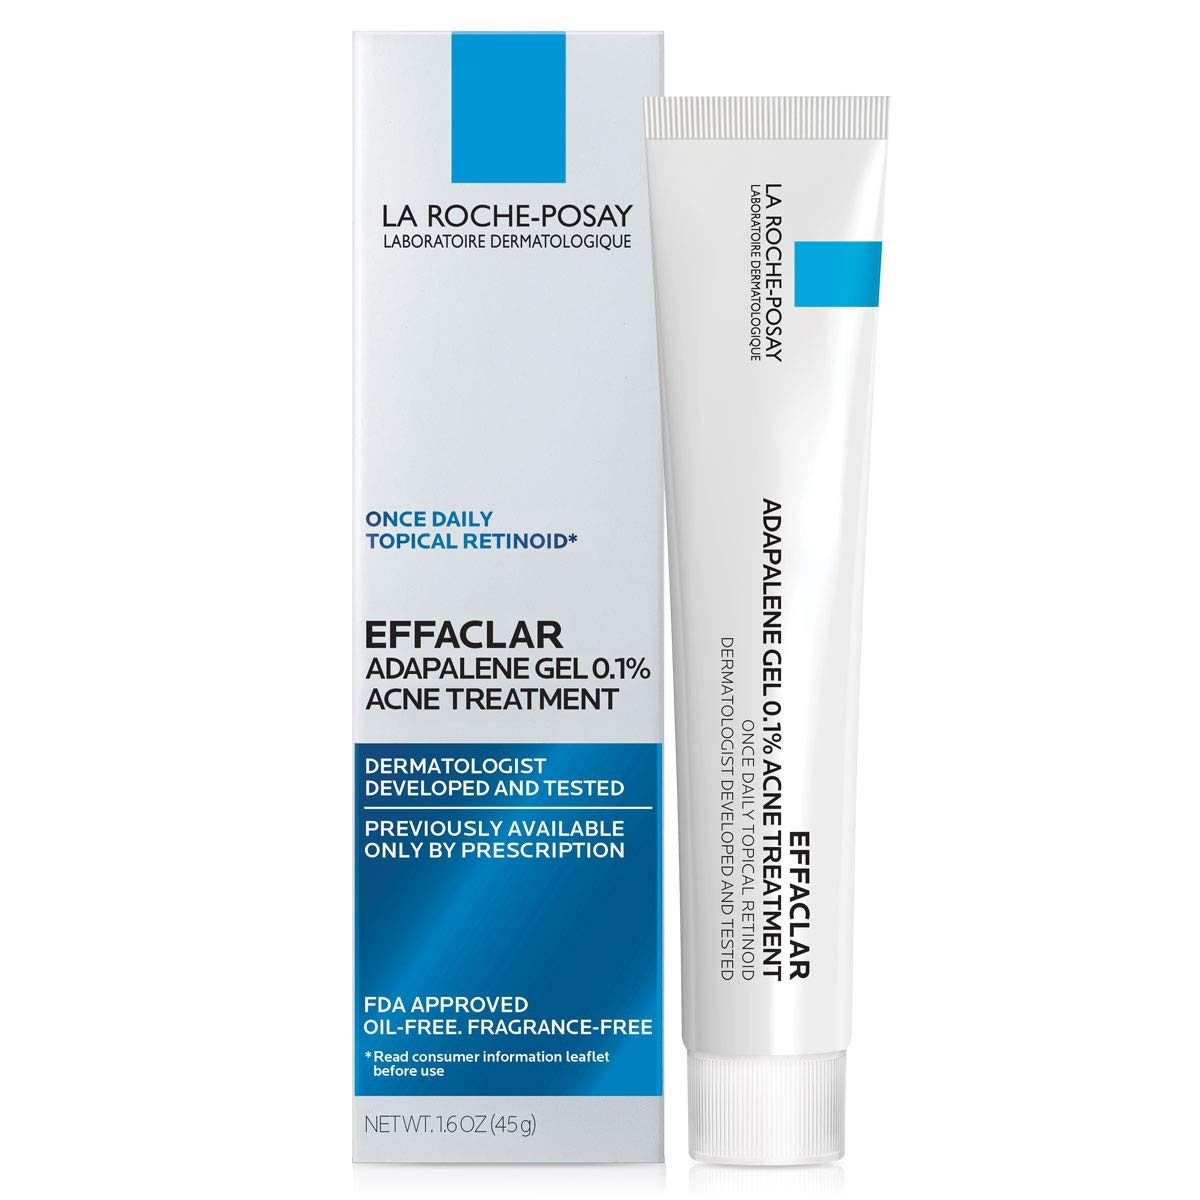 Effaclar Adapalene Gel 0.1% Topical Retinoid Acne Treatment